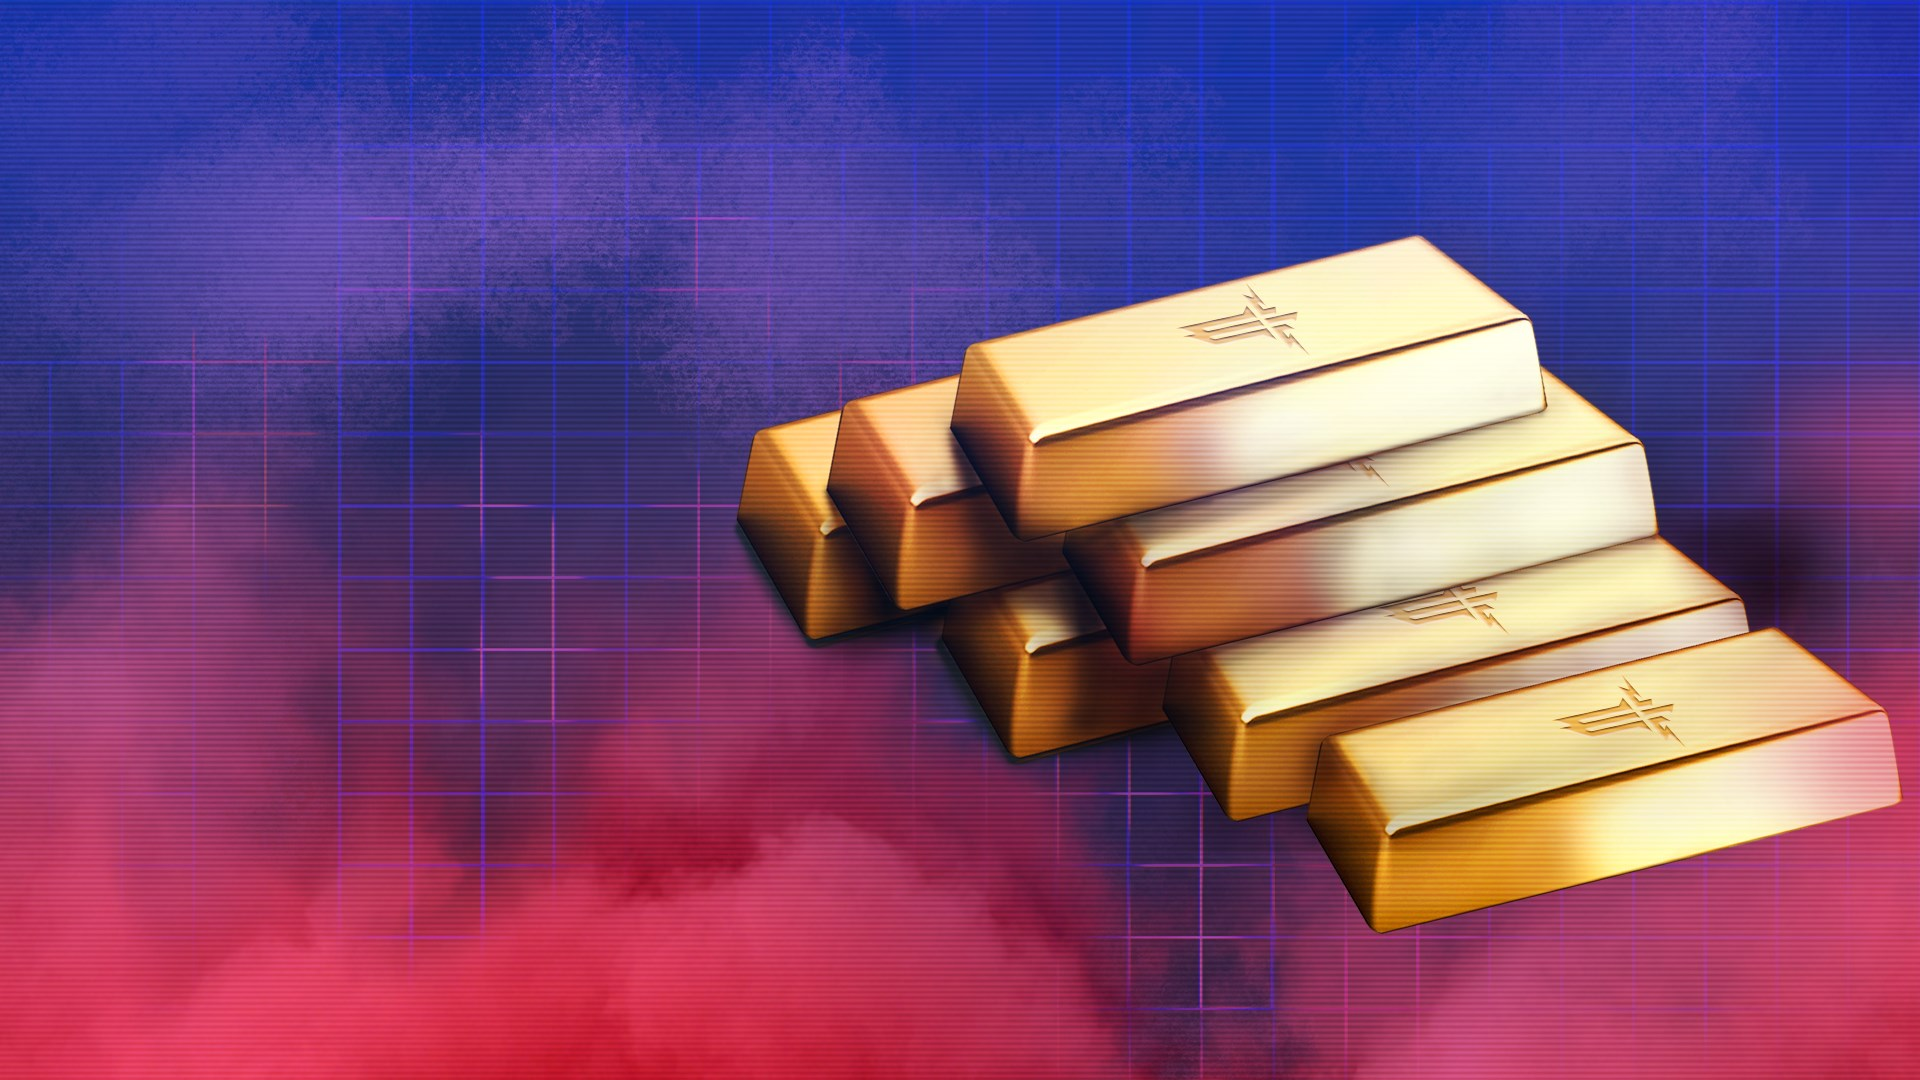 Wolfenstein: Youngblood - 2500 Gold Bars